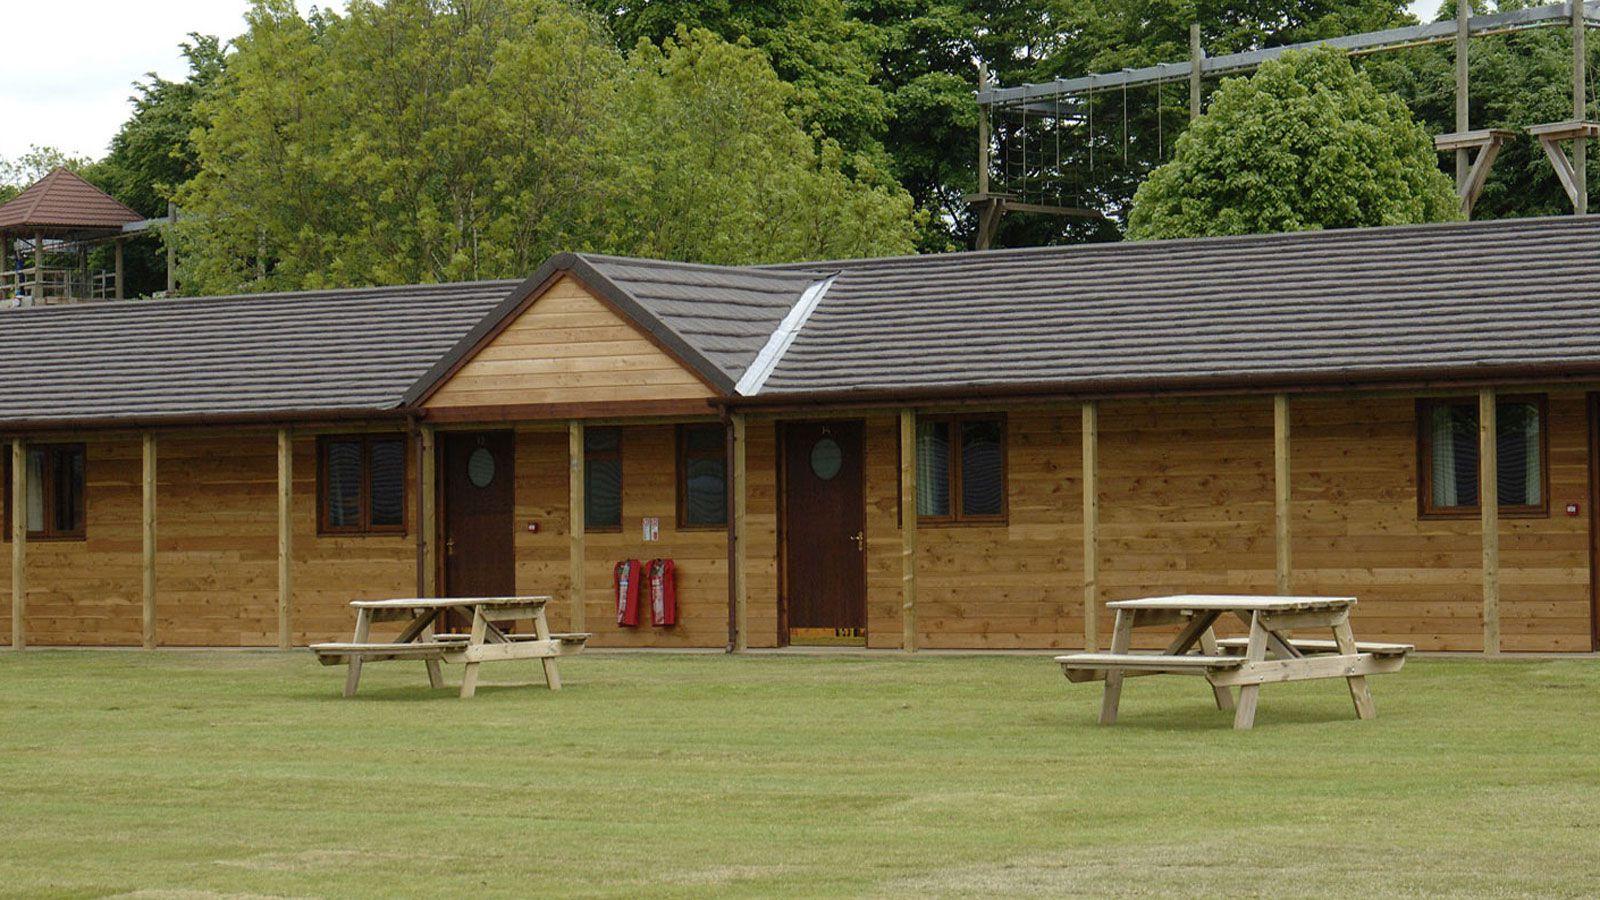 Pgl Caythorpe Court Adventure Holidays And Summer Camps Nr